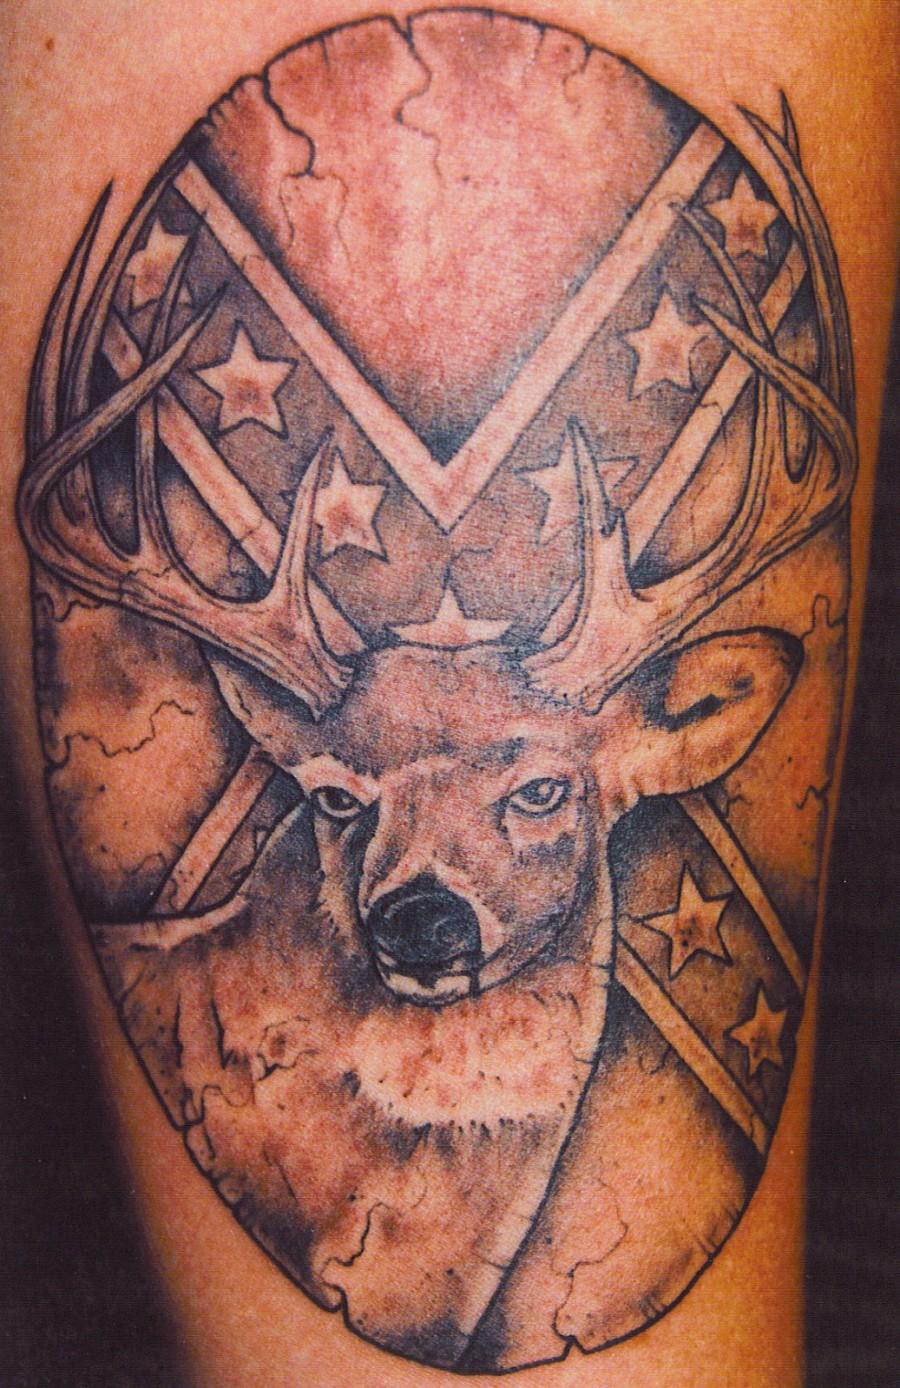 My Tattoo Designs Confederate Flag Tattoos